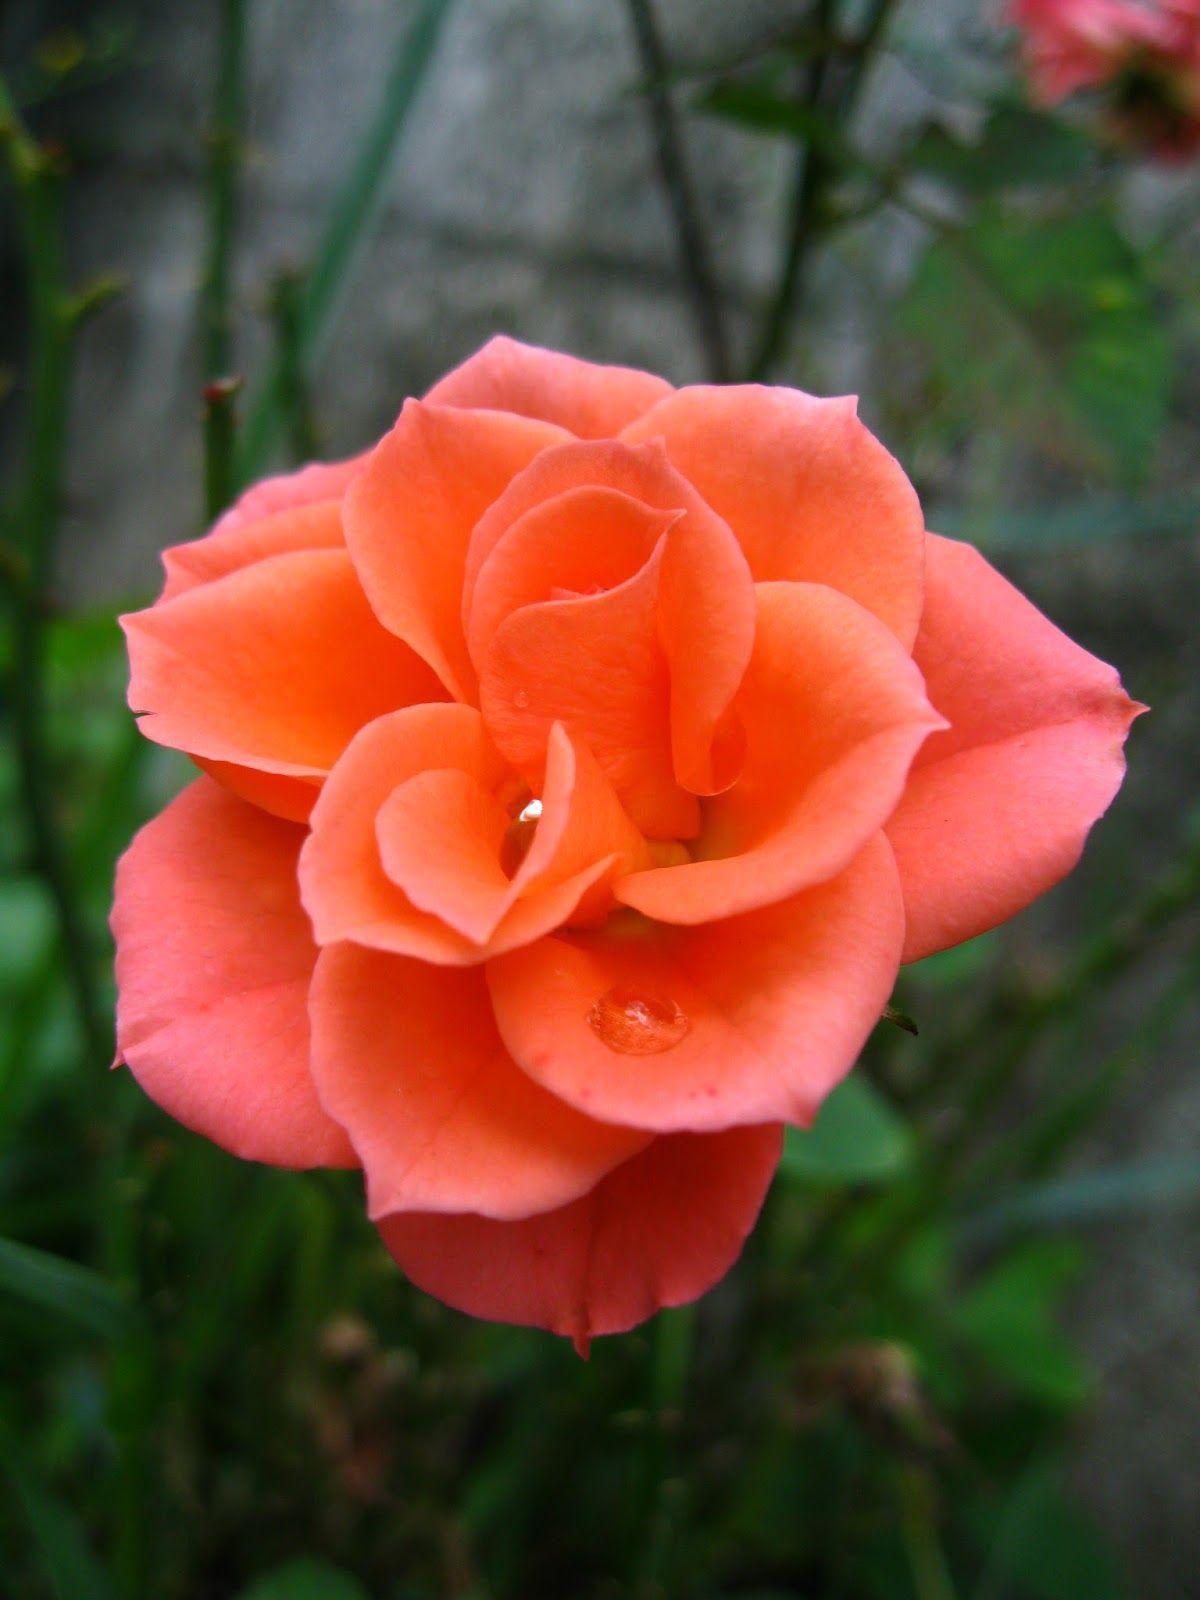 Garden Therapy Roses Are Love Rose Orange Rosa Roses Garden File Commons Therapy Wikipedia Wikimedia K In 2020 Vegetable Garden Design Backyard Design Garden Design